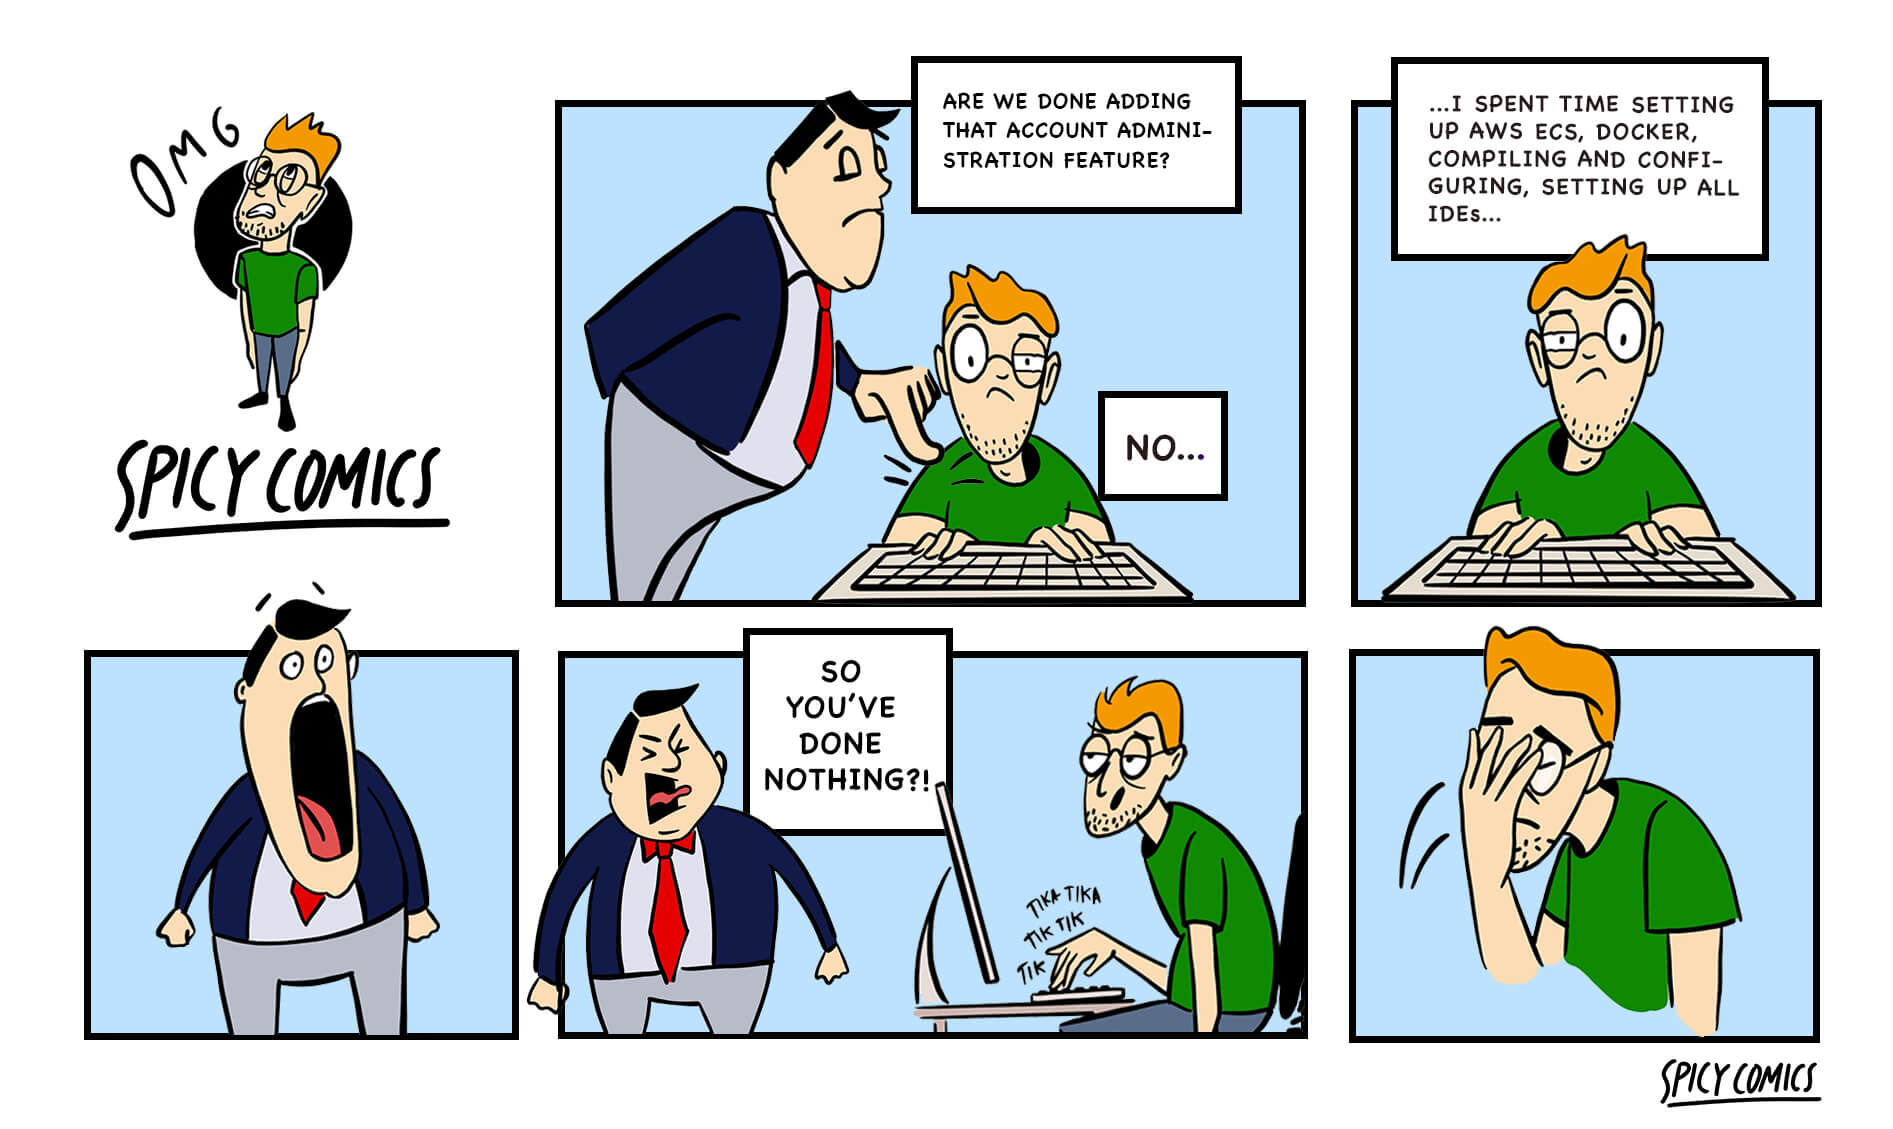 Spicy Comic #7 - Work, Love and Understanding